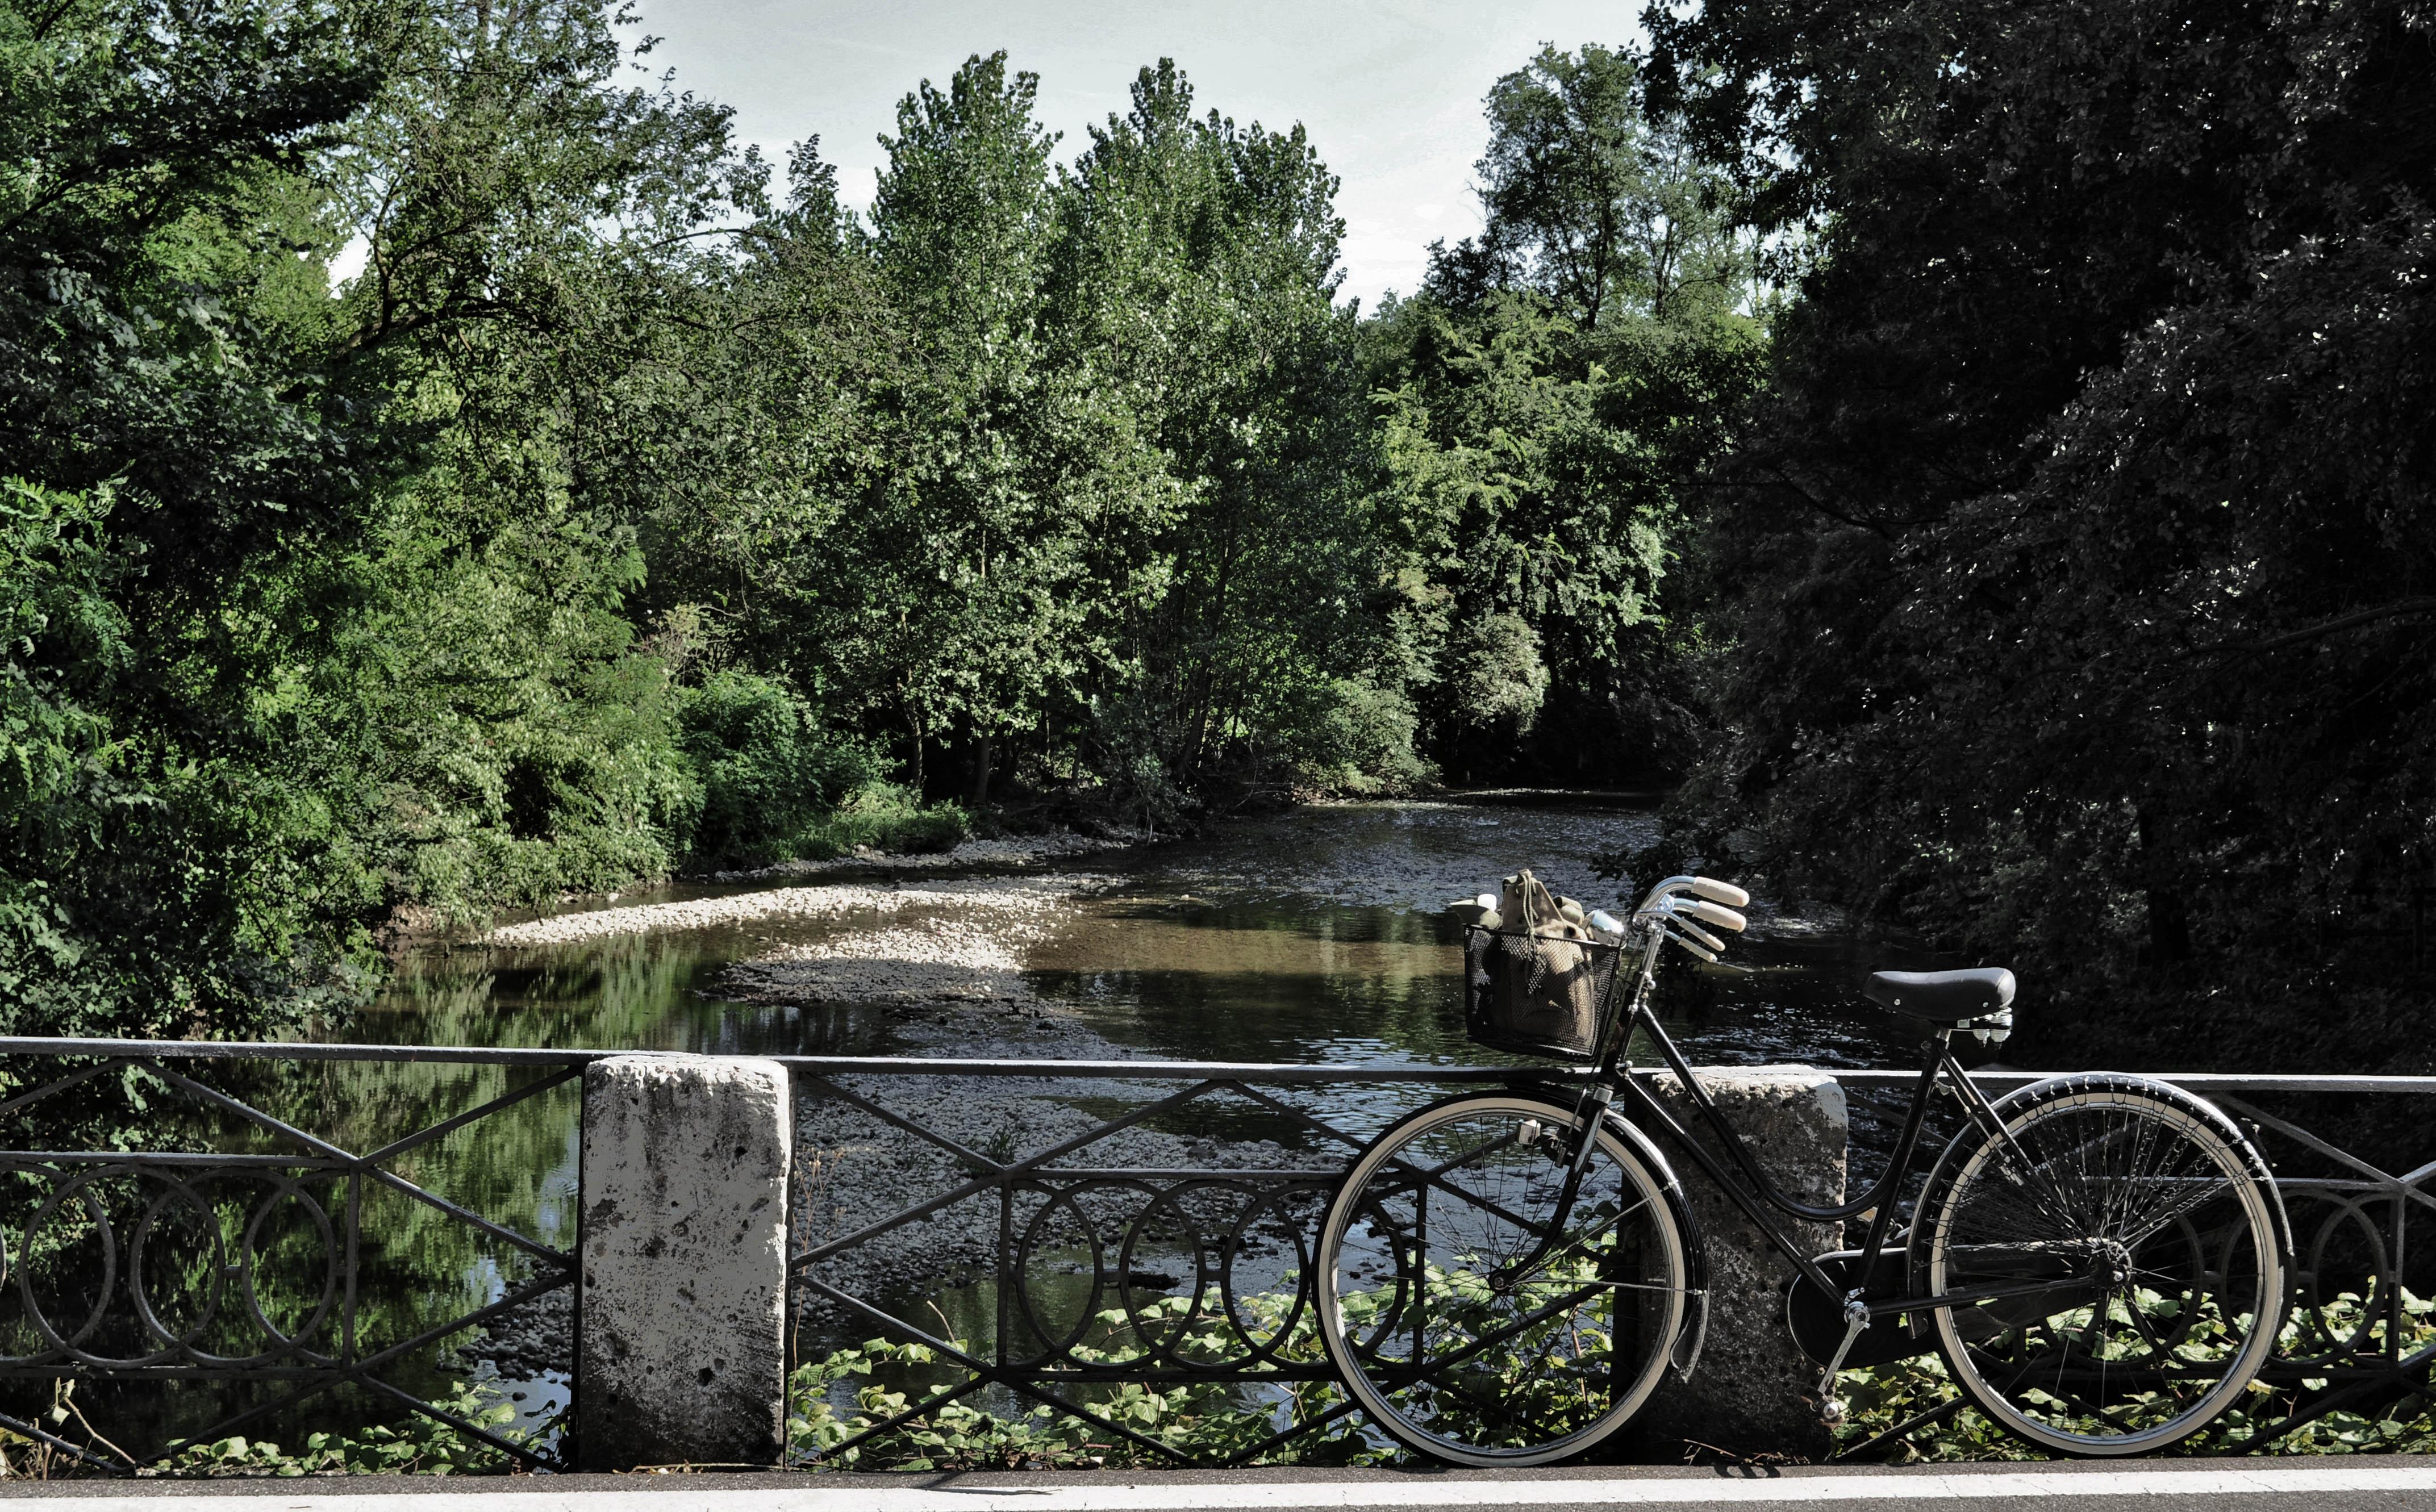 Noleggio bici Parco di Monza 2